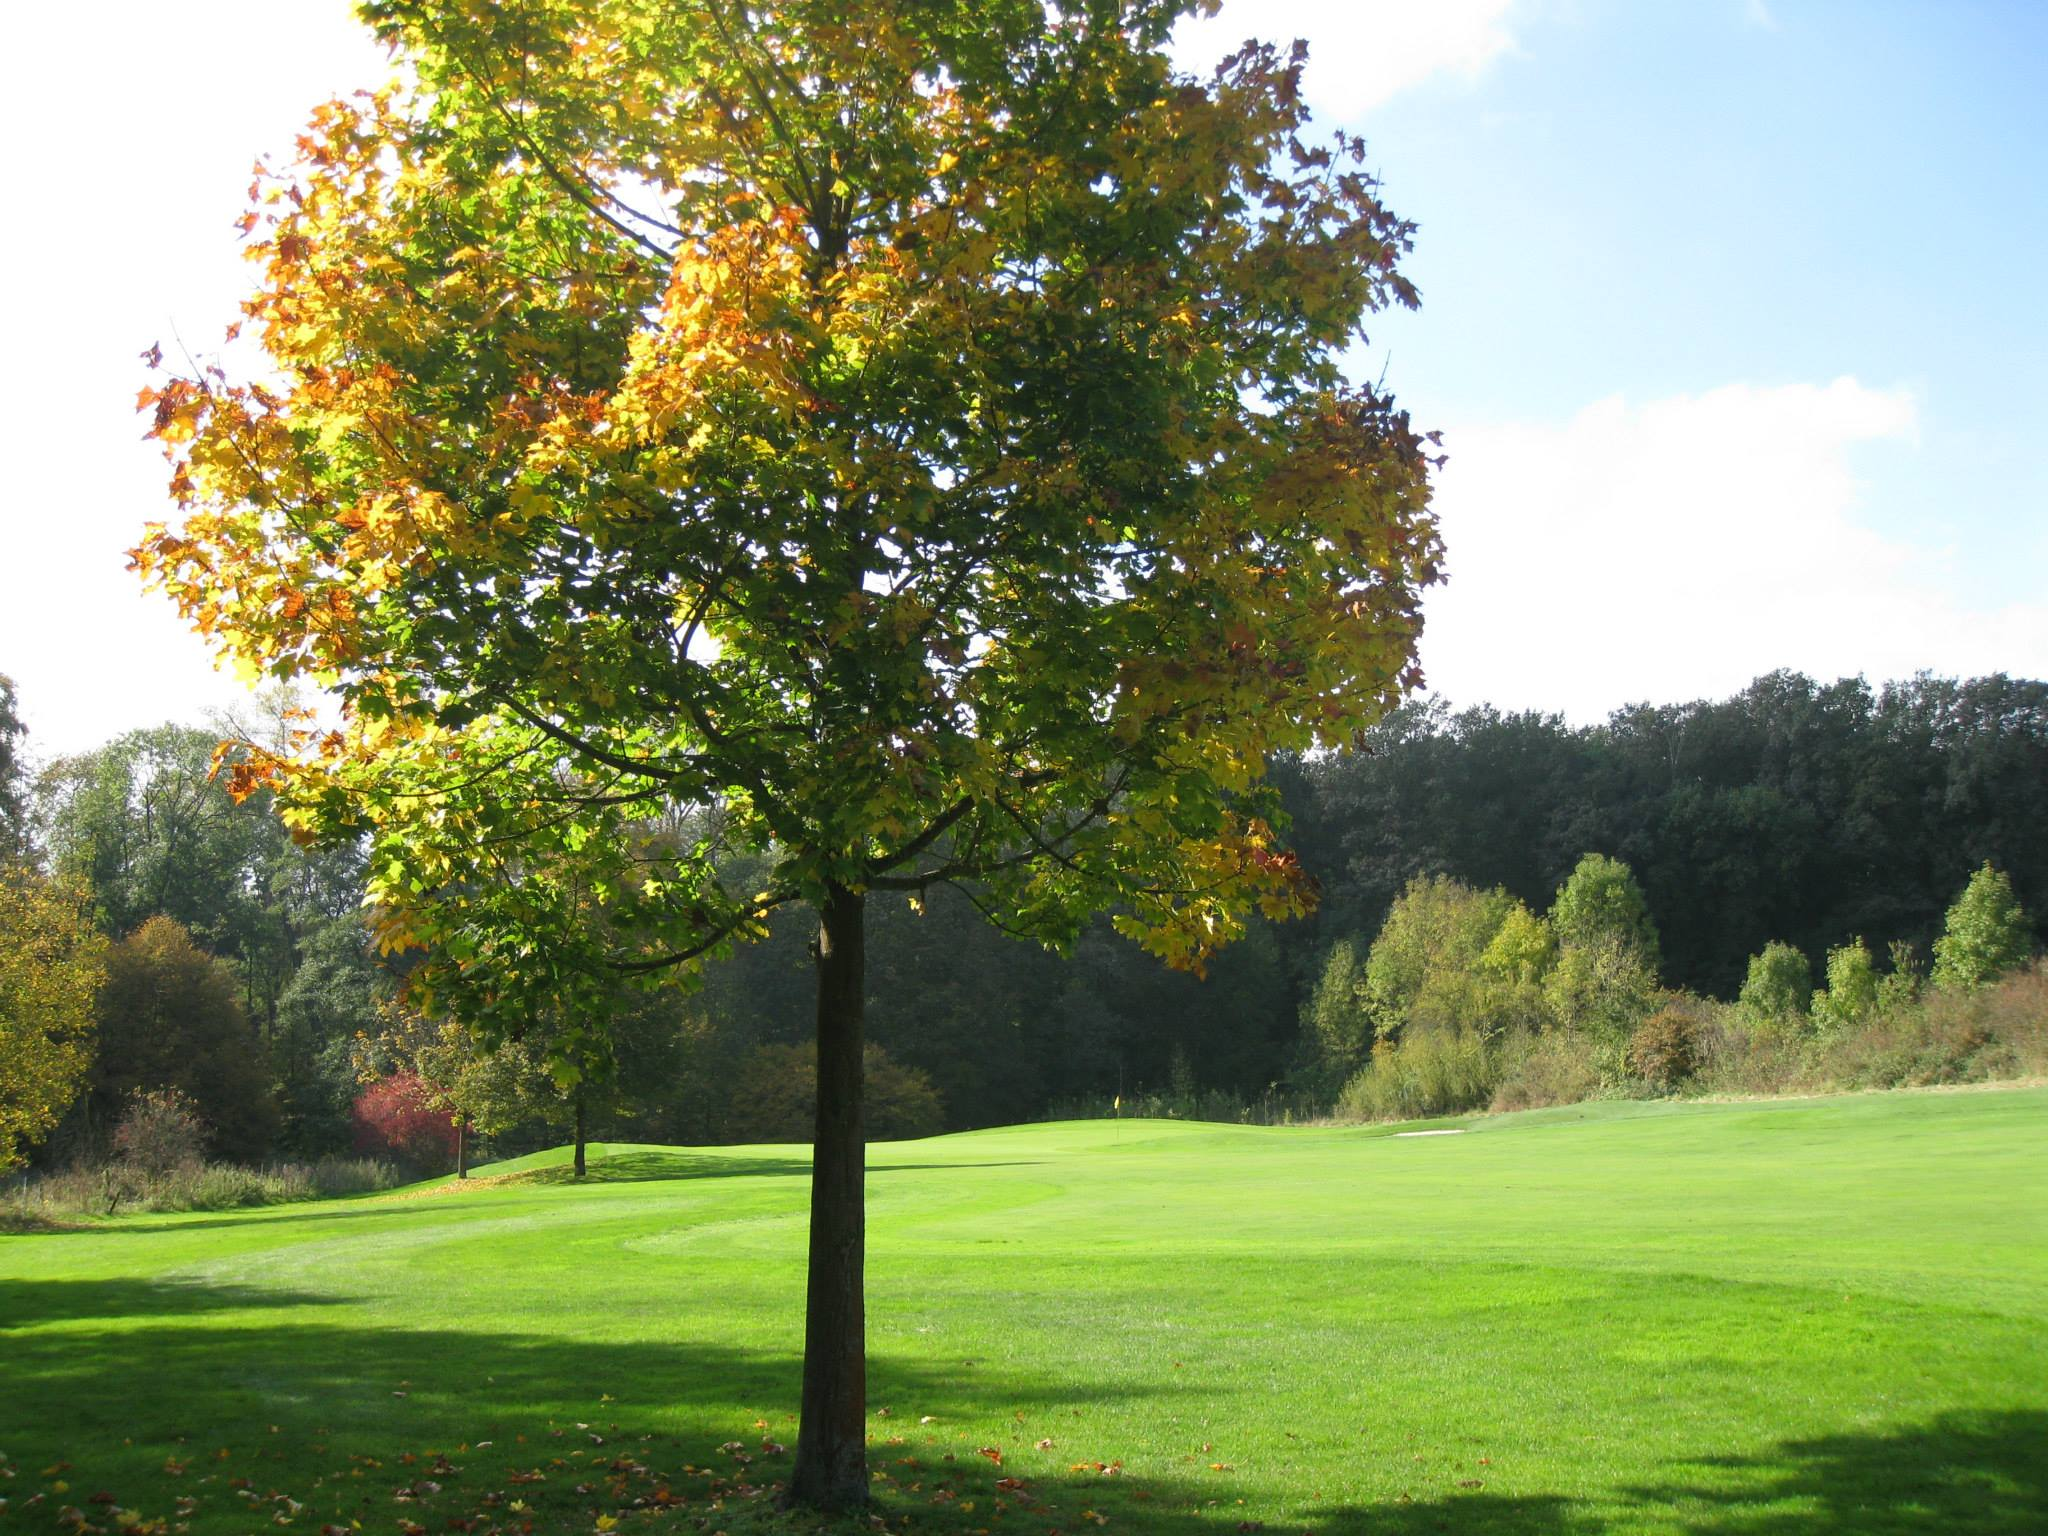 Overview of golf course named Licher Golf-Club Furstliches Hofgut Kolnhausen e.V.